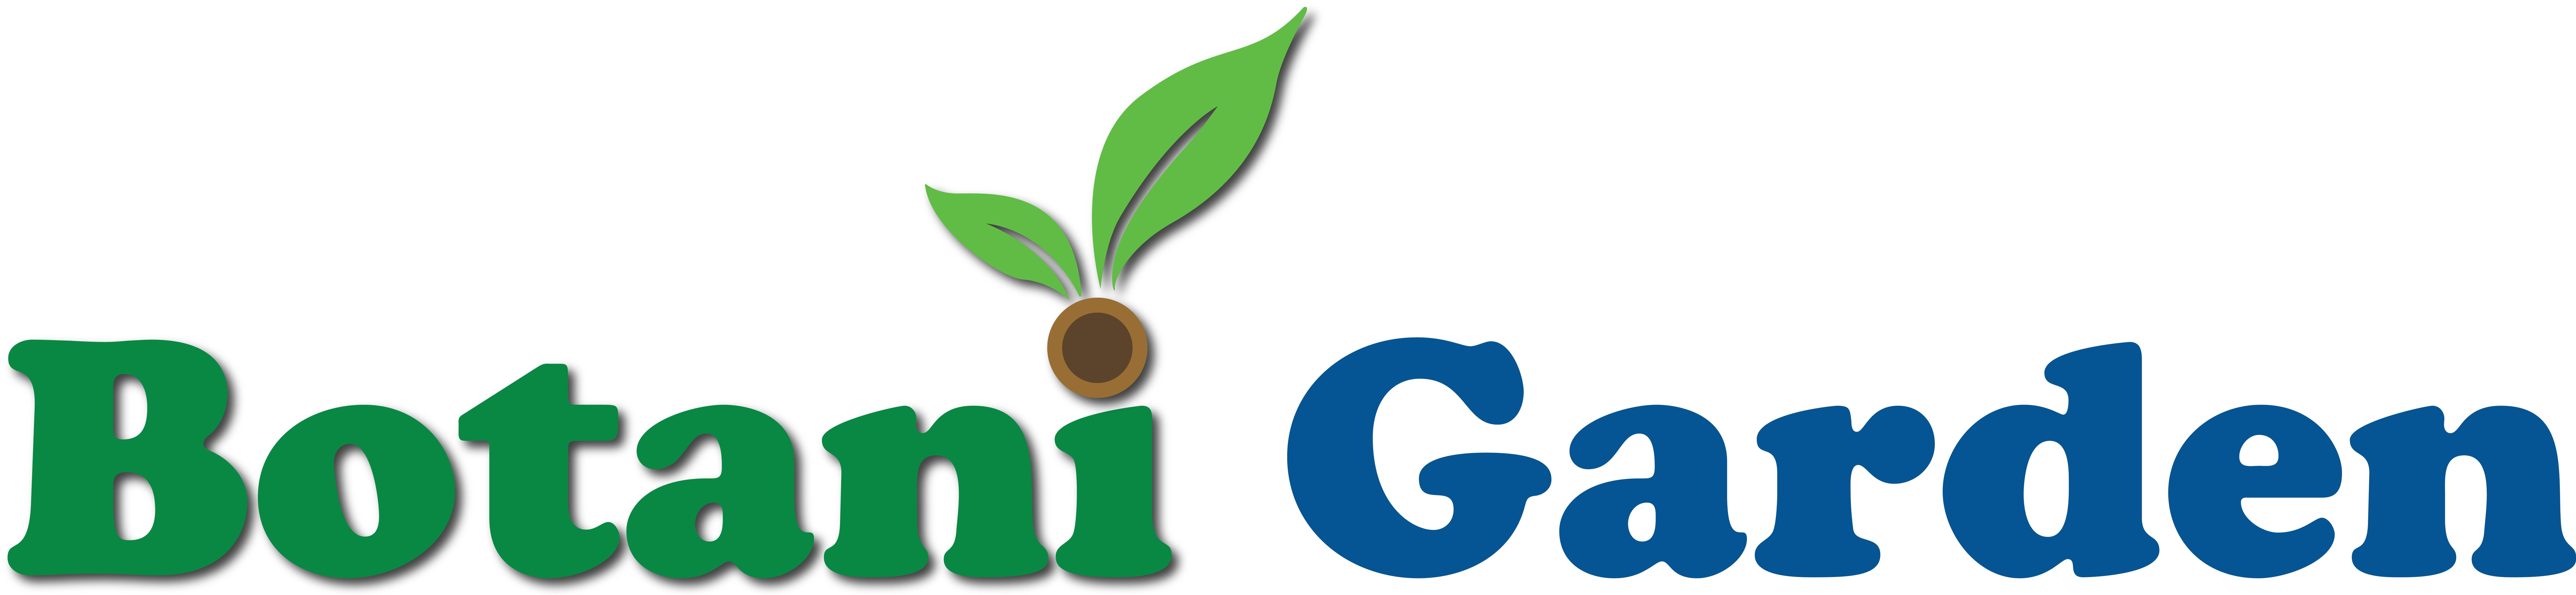 Botani Garden | Horticulture | Hydroponics | Organics